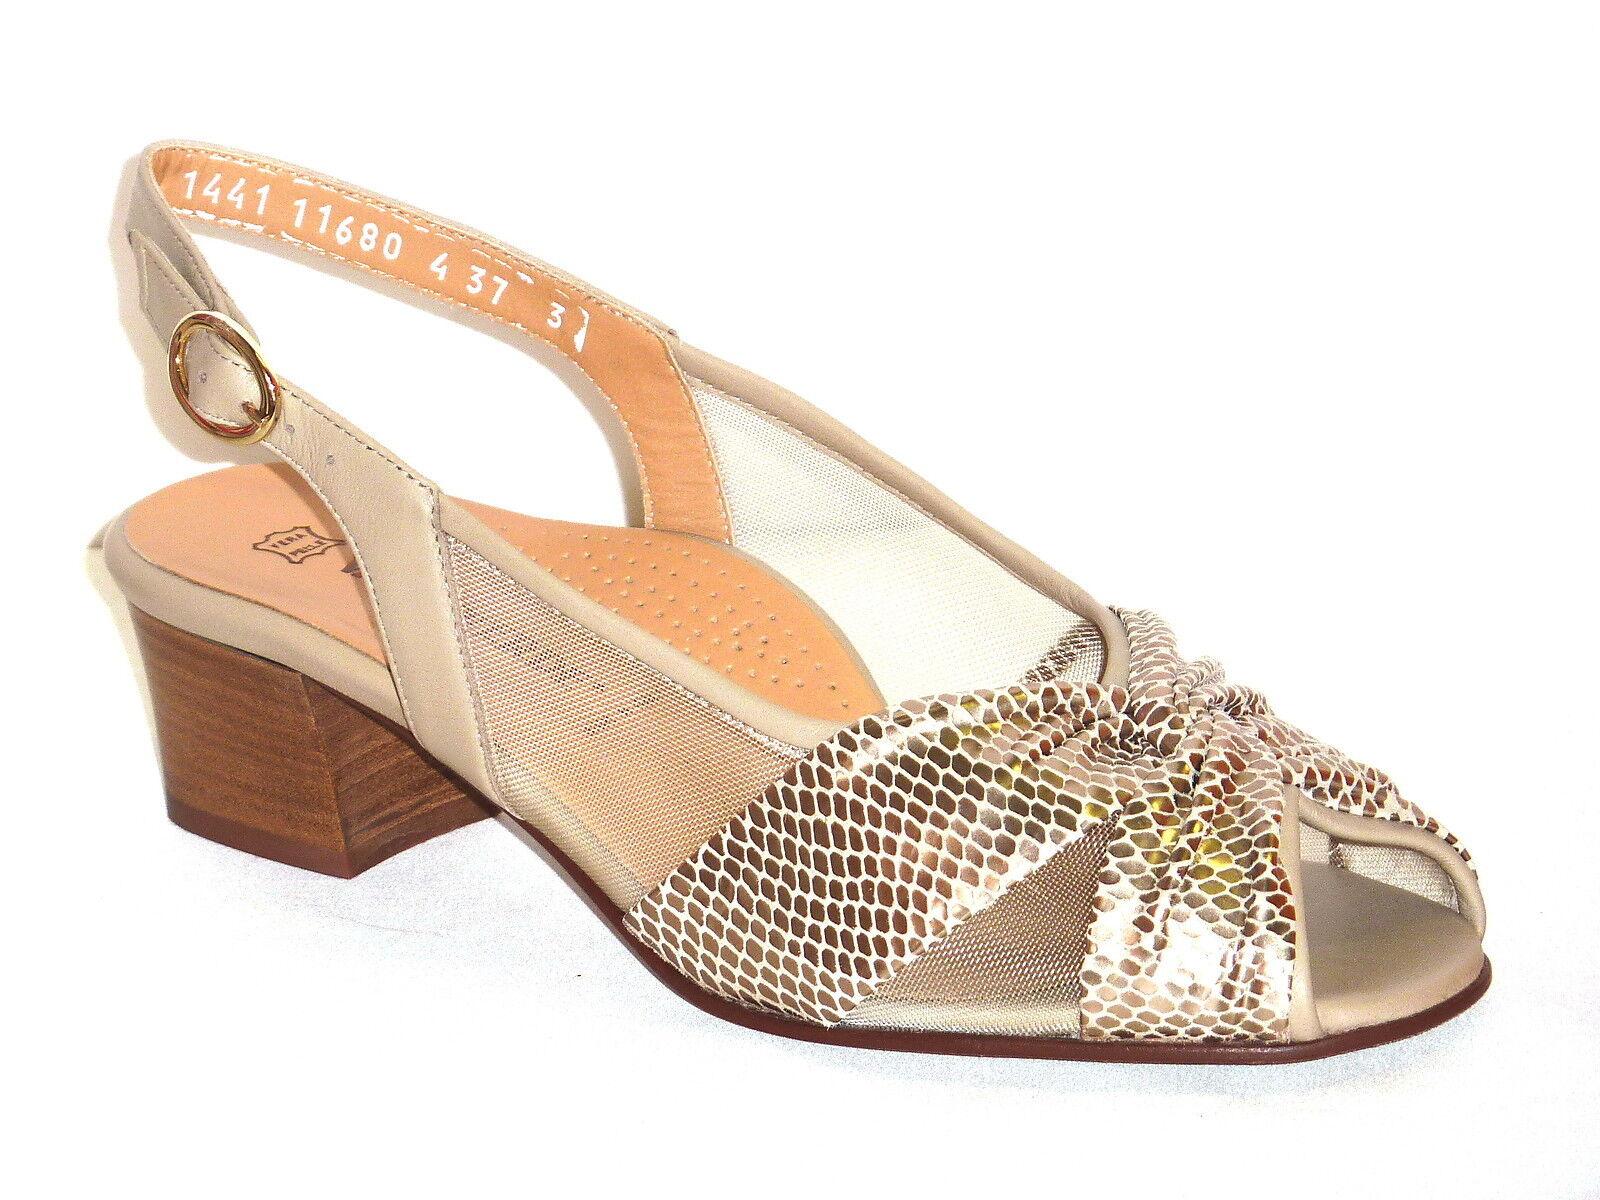 SEXY sandali STRASS plateau tacco 12 n. GLAMOUR 35 CHAMPAGNE scarpe Sposa GLAMOUR n. chic 7a9122